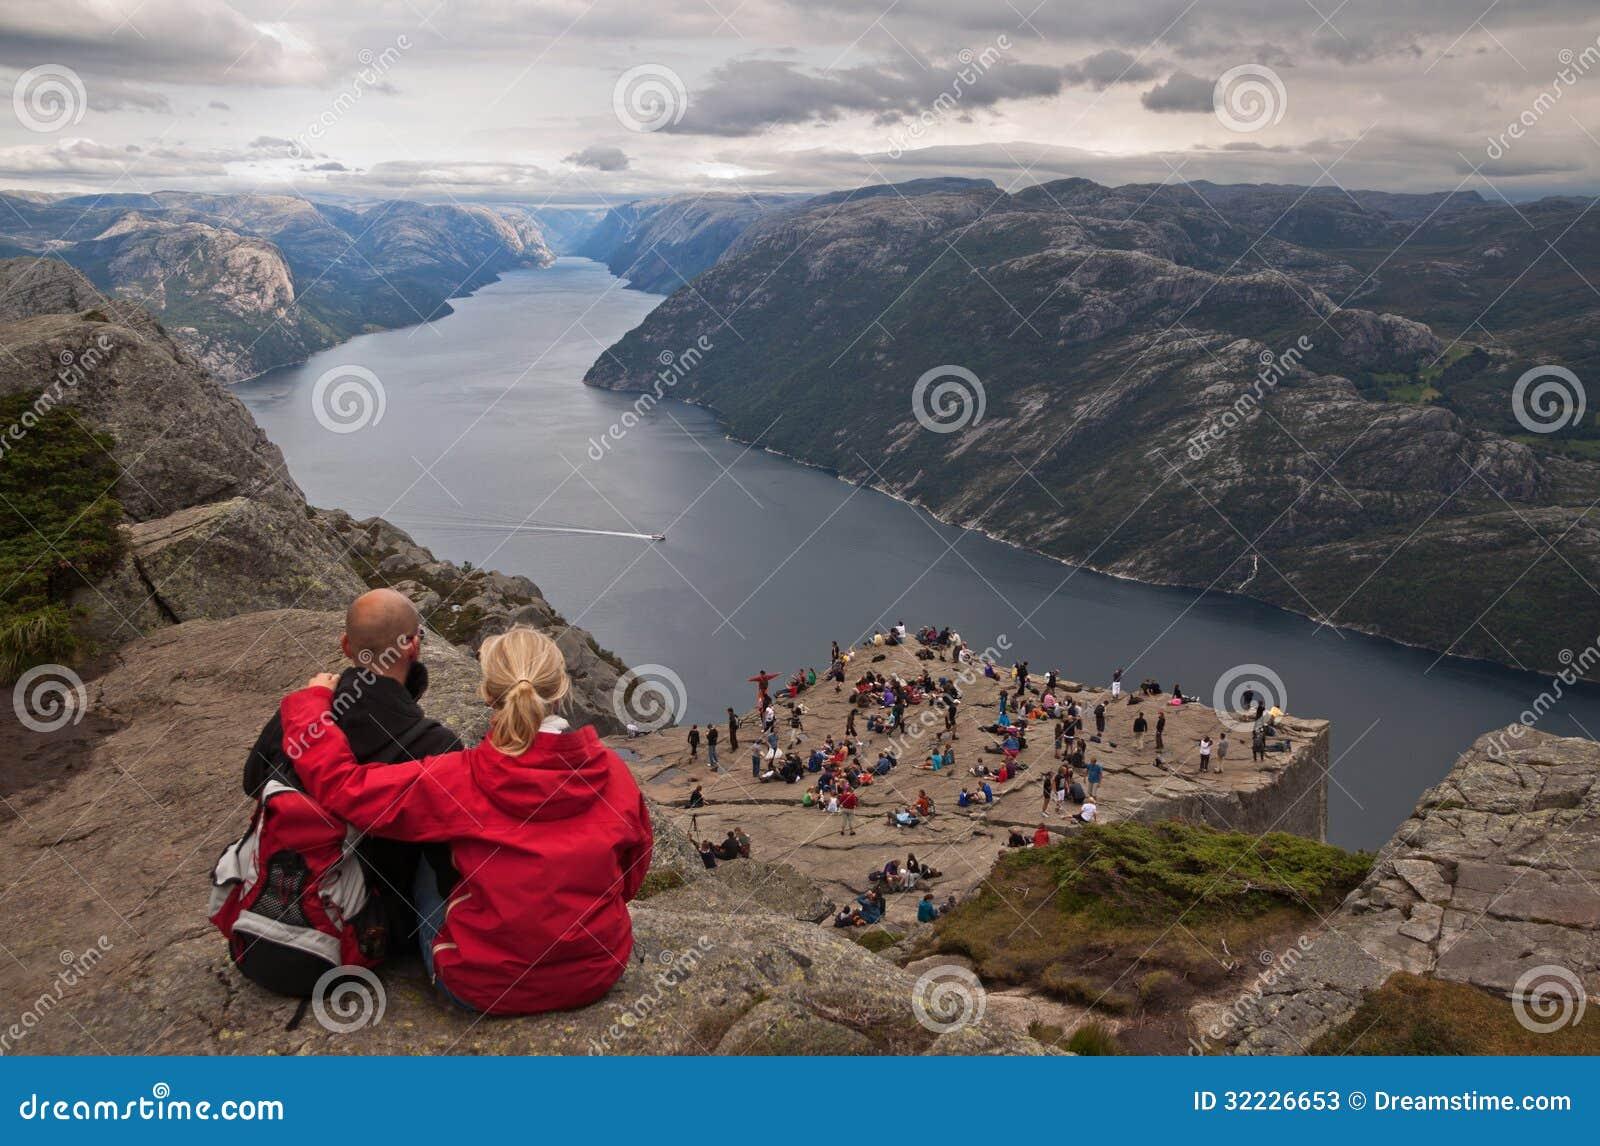 Download Sobre A Vaidade. Preikestolen, Noruega. Foto de Stock Editorial - Imagem de borda, pulpit: 32226653